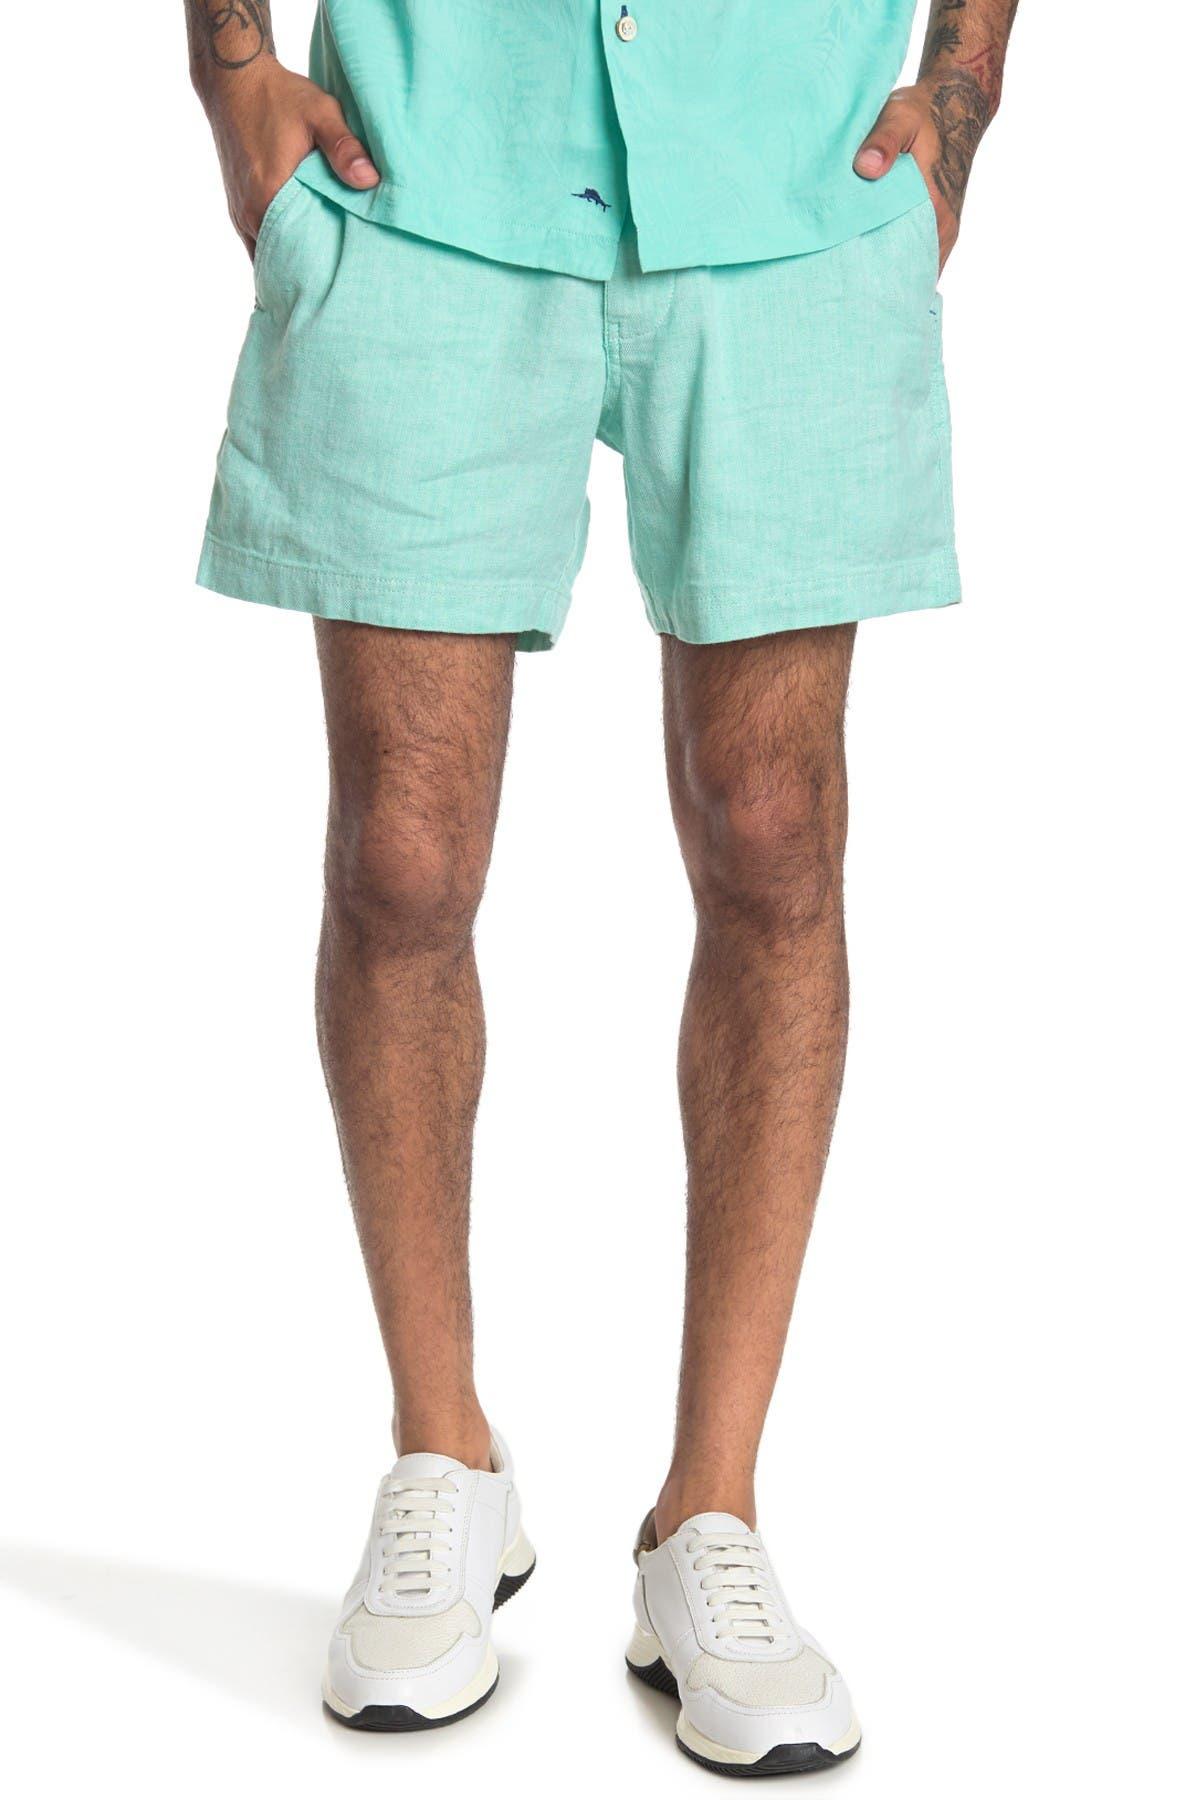 Image of Tommy Bahama Linen Blend Shorts